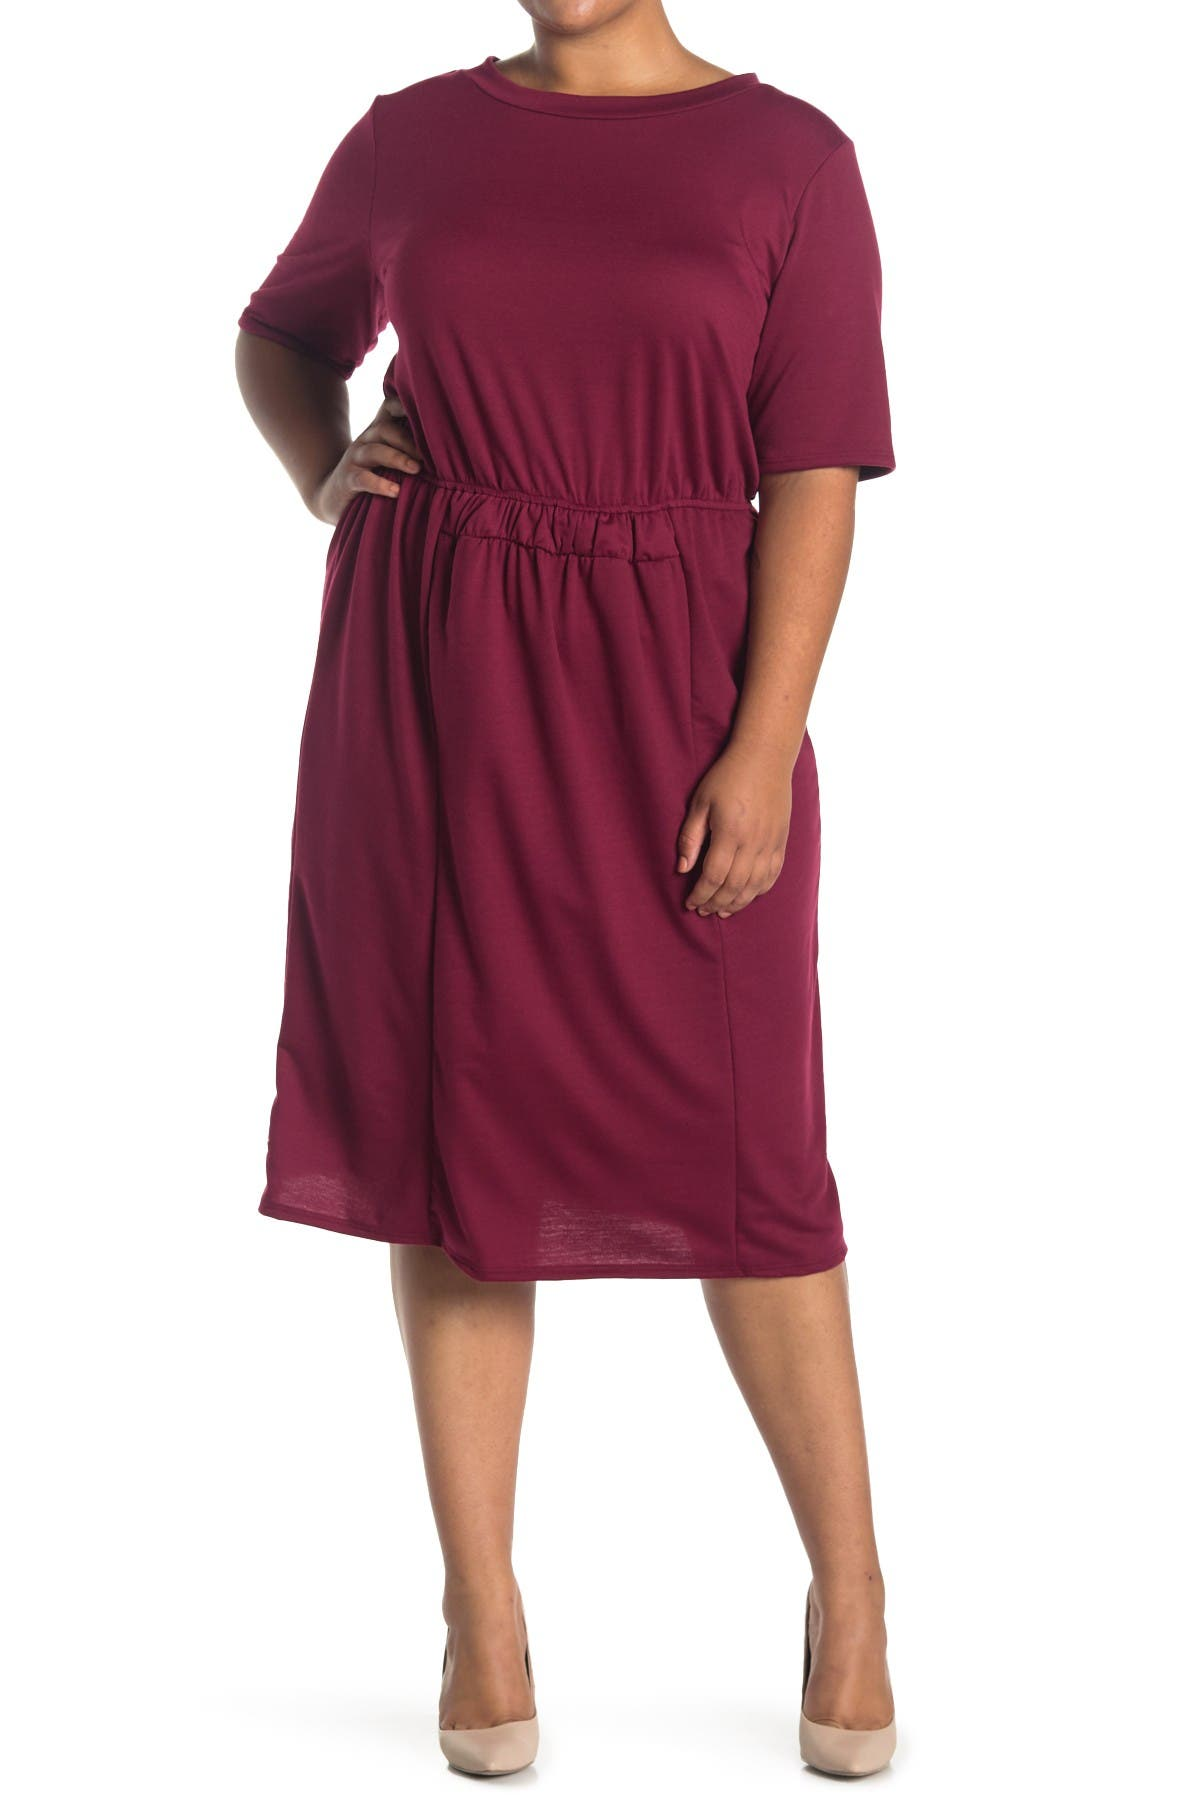 Forgotten Grace Short Sleeve Smock Waist Dress at Nordstrom Rack